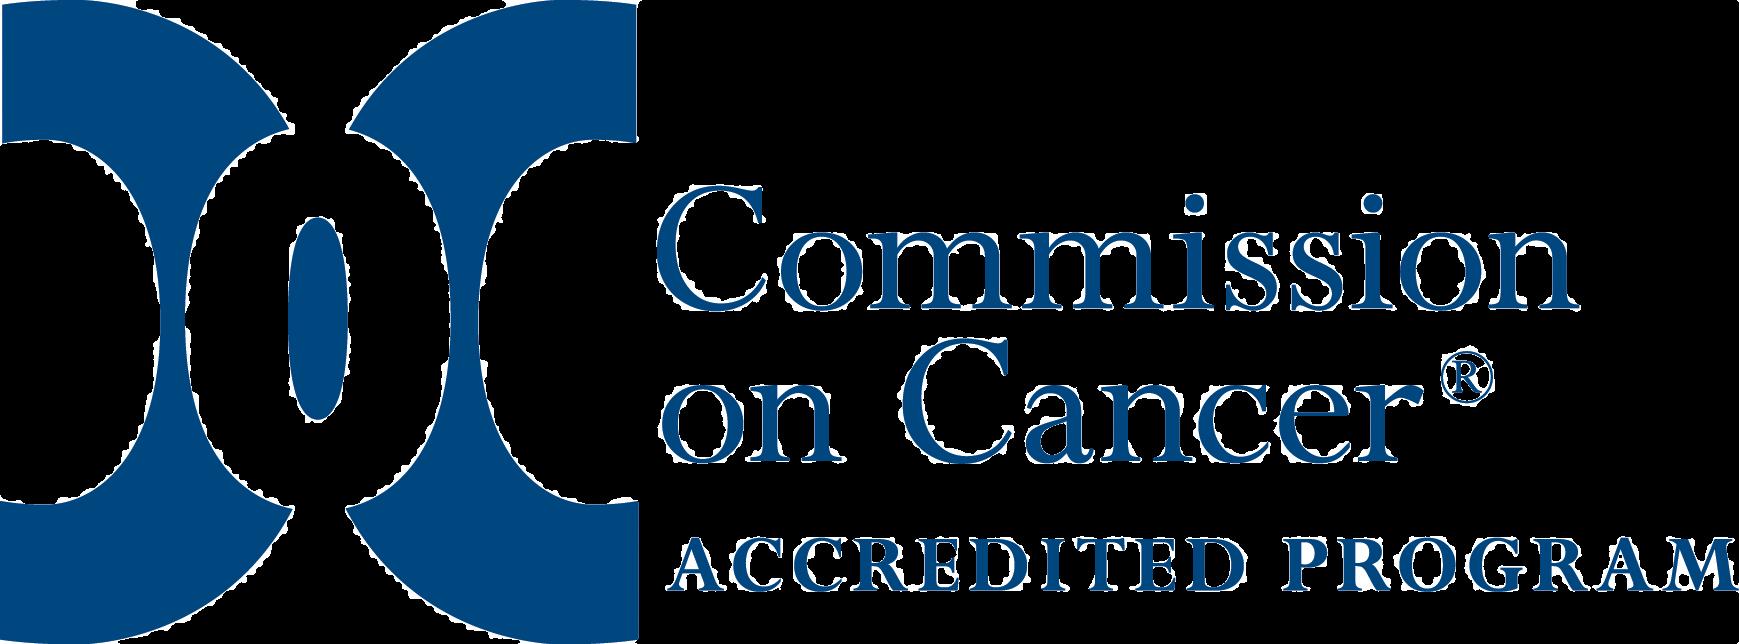 coc_accreditation